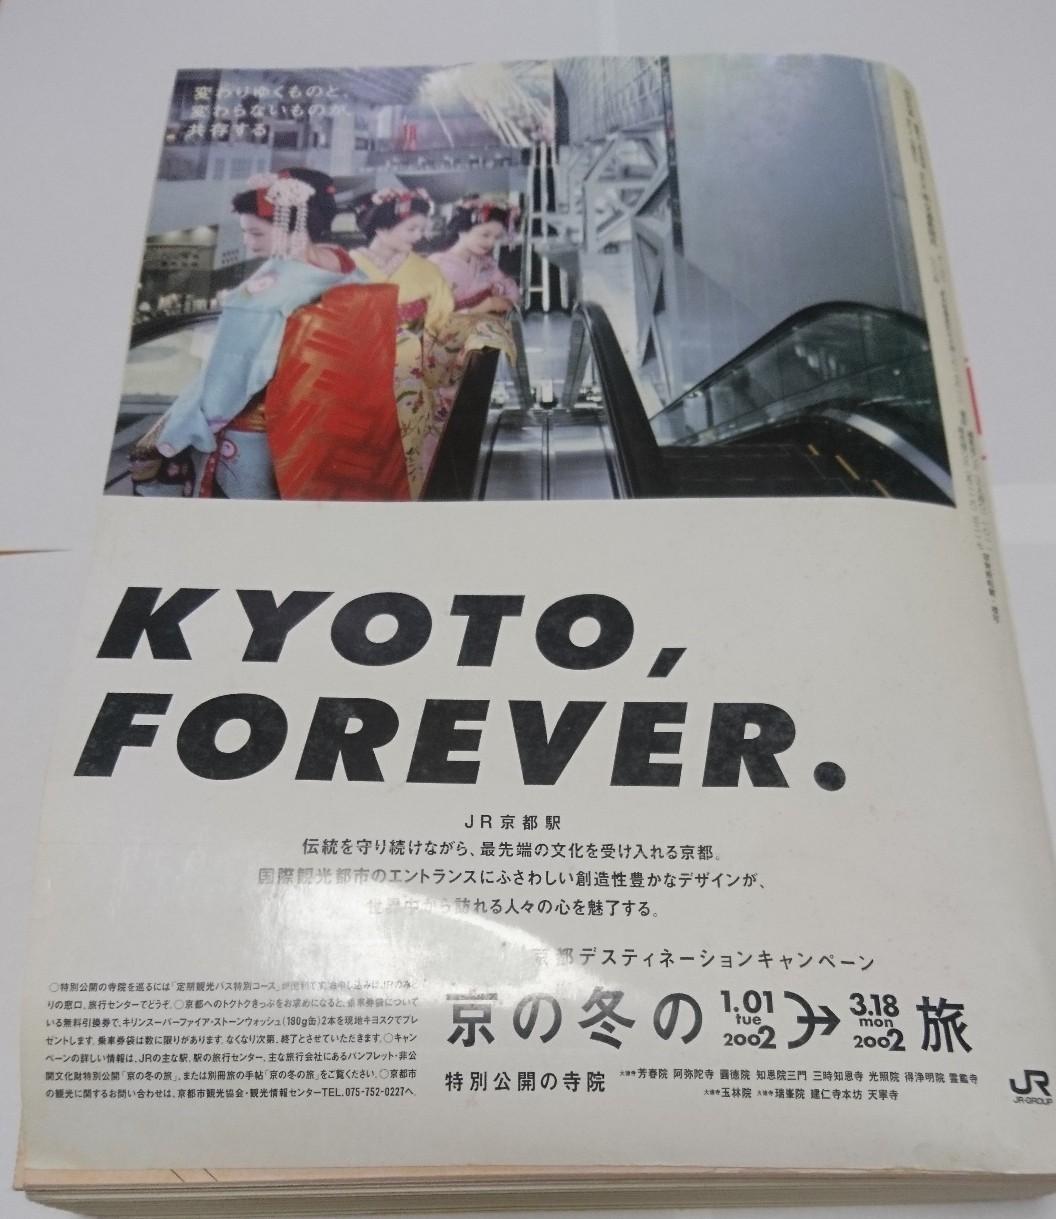 JR時刻表2002年2月号、あずさ2号復活!JR北海道旅客鉄道株式会社、発行所、交通新聞社_b0106766_19392371.jpg